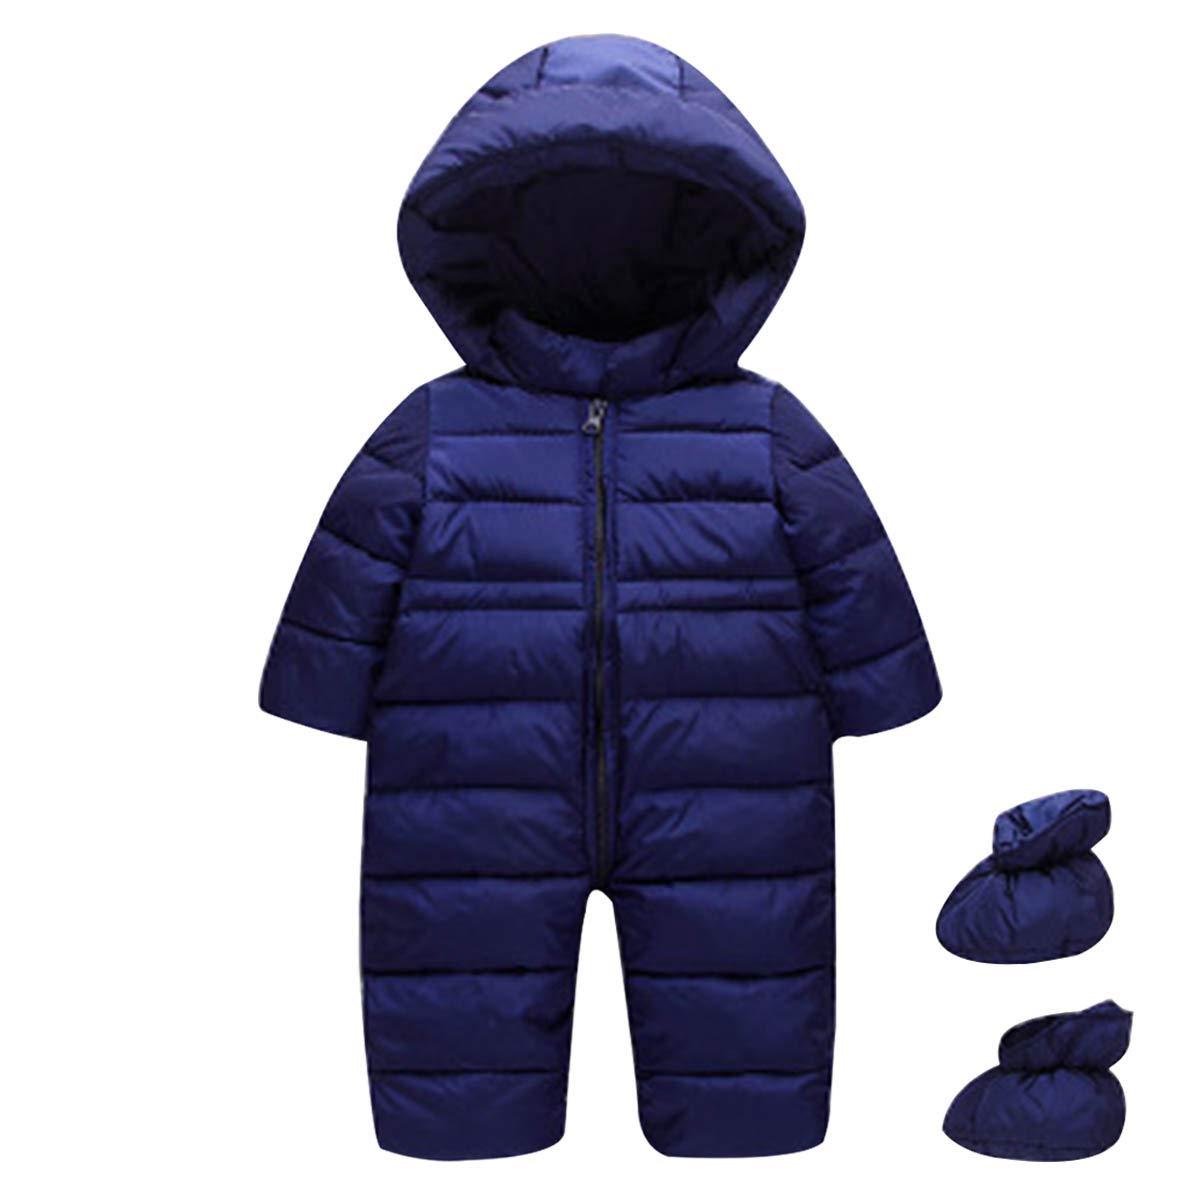 famuka Baby Schneeanzug Jungen Mädchen Winter Babybekleidungsset